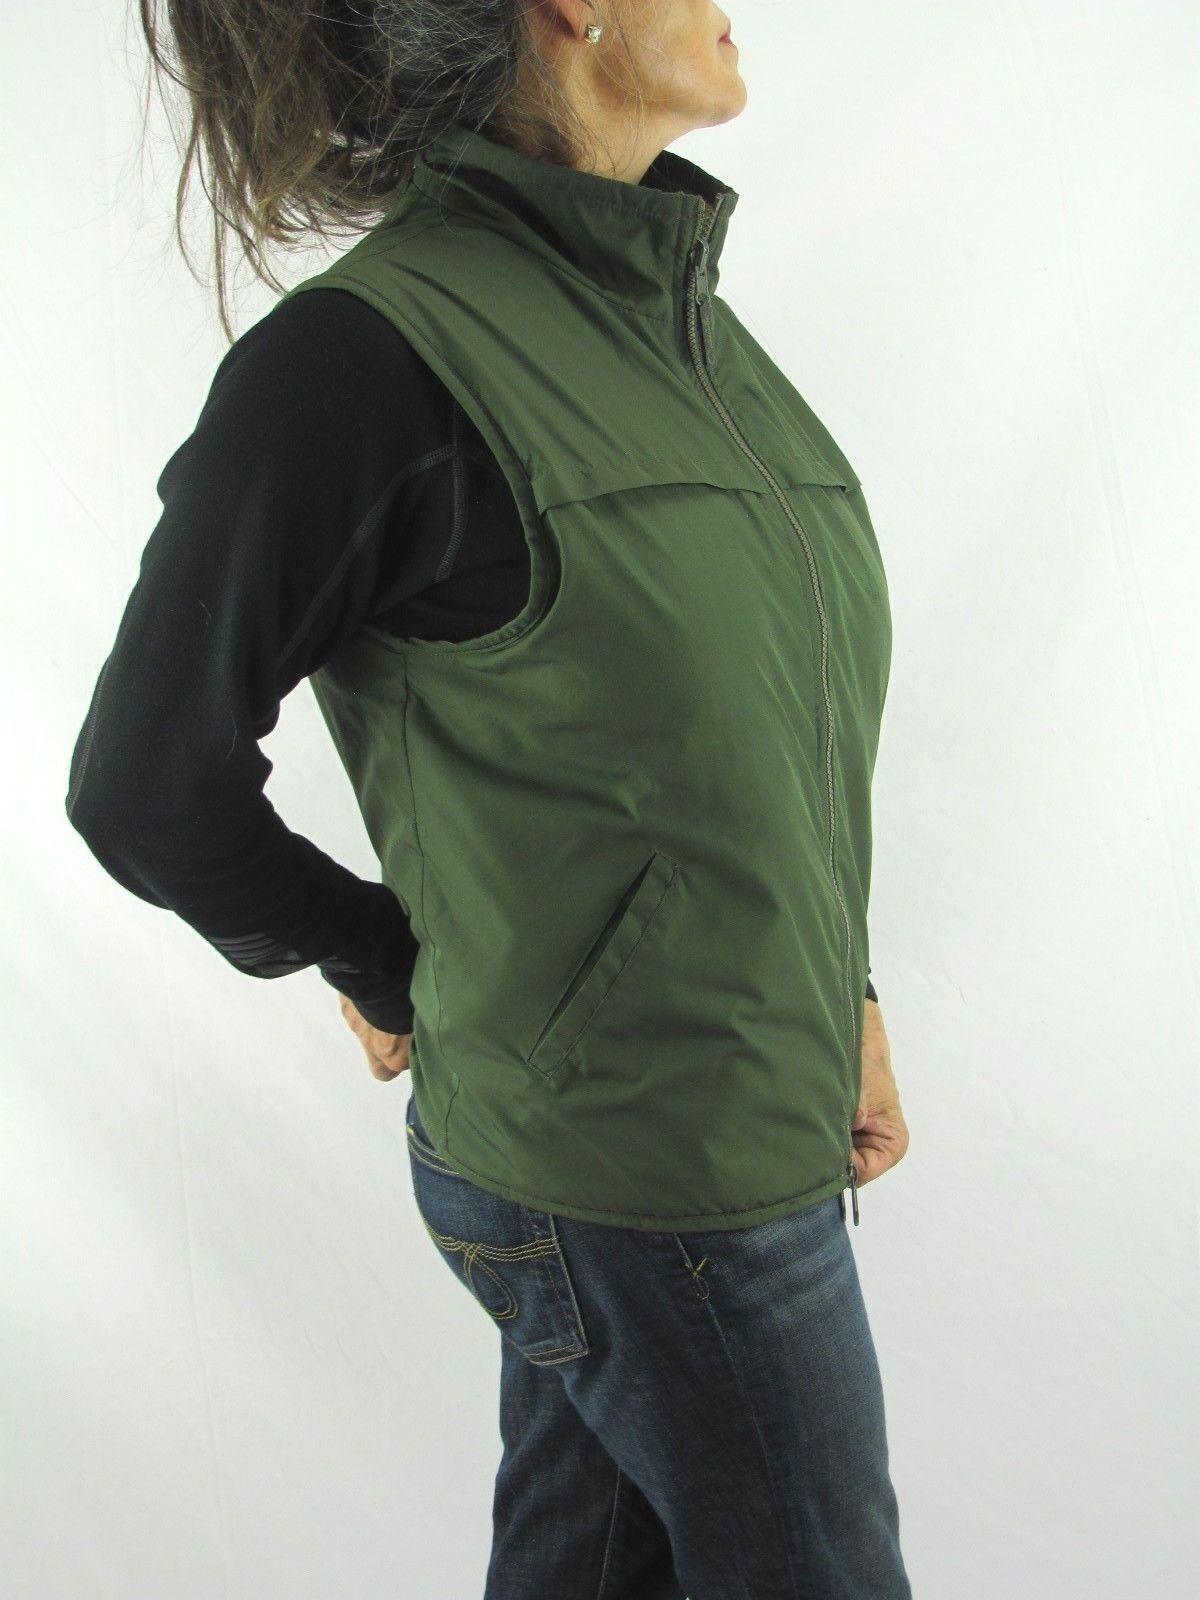 Catalina VTG Olive Green Smooth n Tan Fleece Reve… - image 3